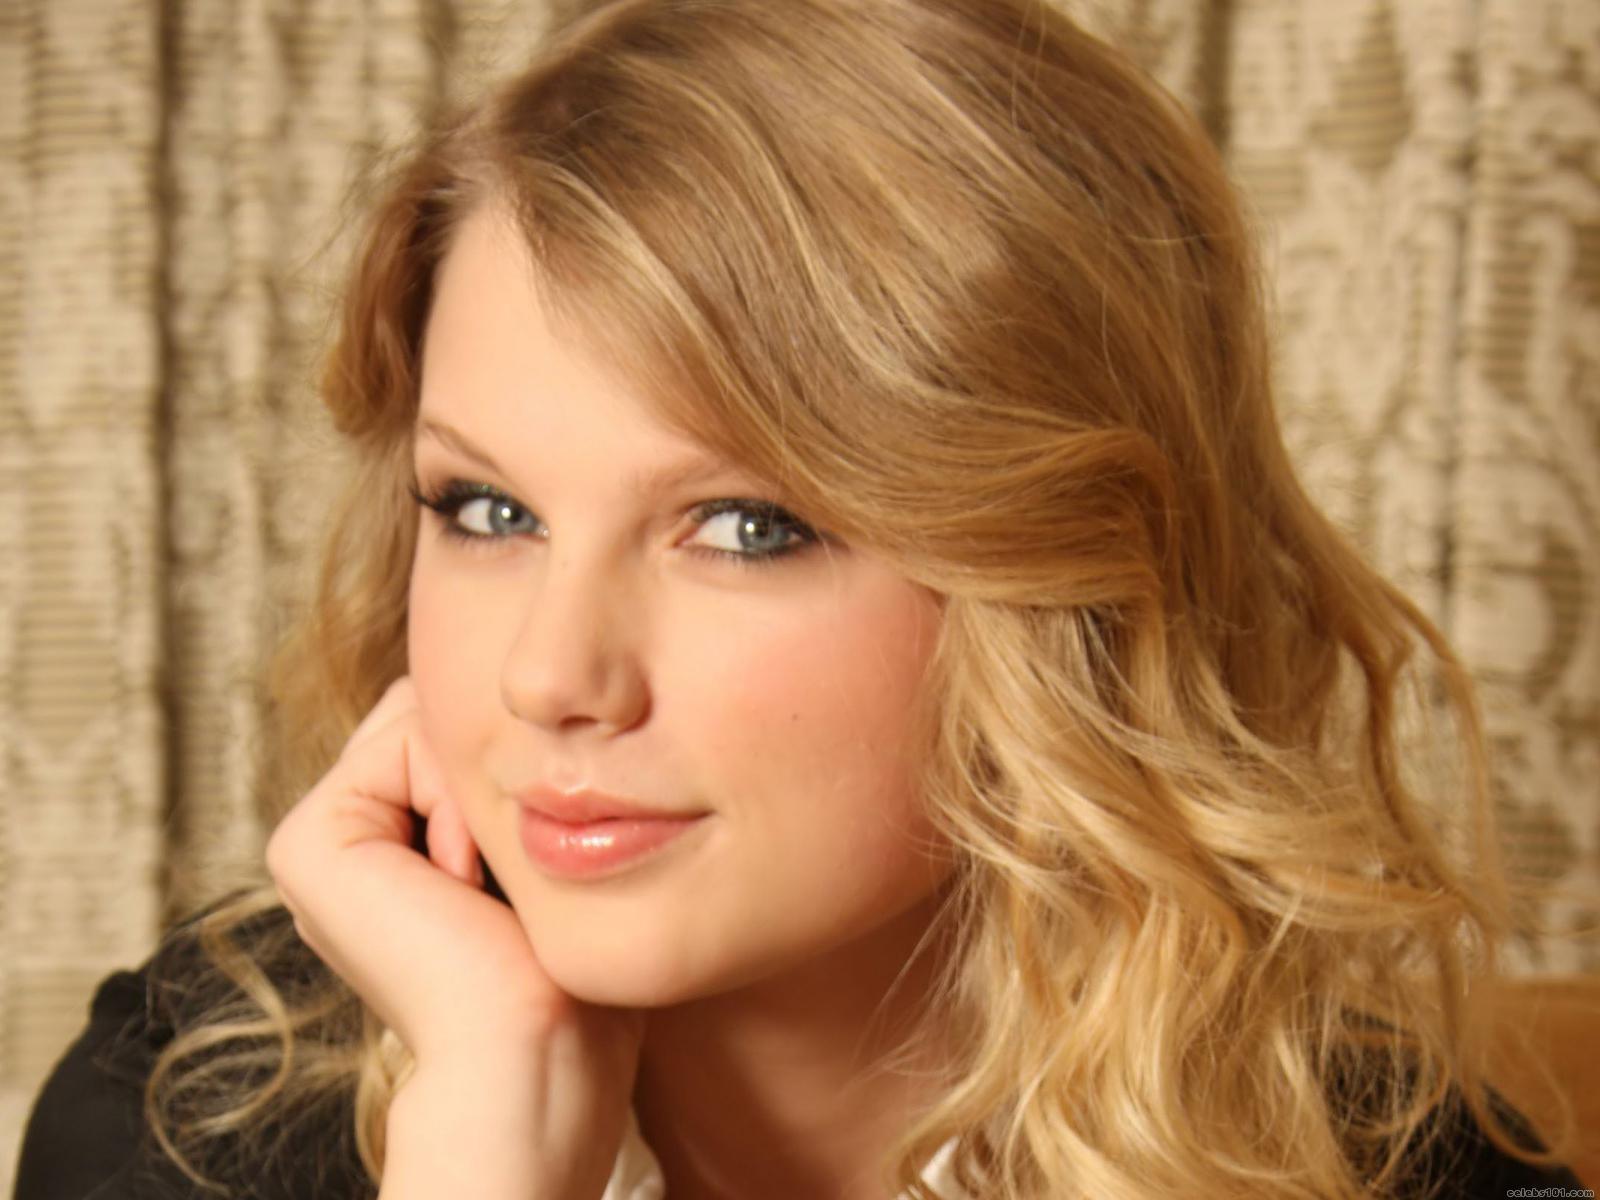 http://3.bp.blogspot.com/-D_CUV7IBGFw/UMojm4zILAI/AAAAAAAACkM/Oj6reO2cHnw/s1600/Taylor-Swift.jpg